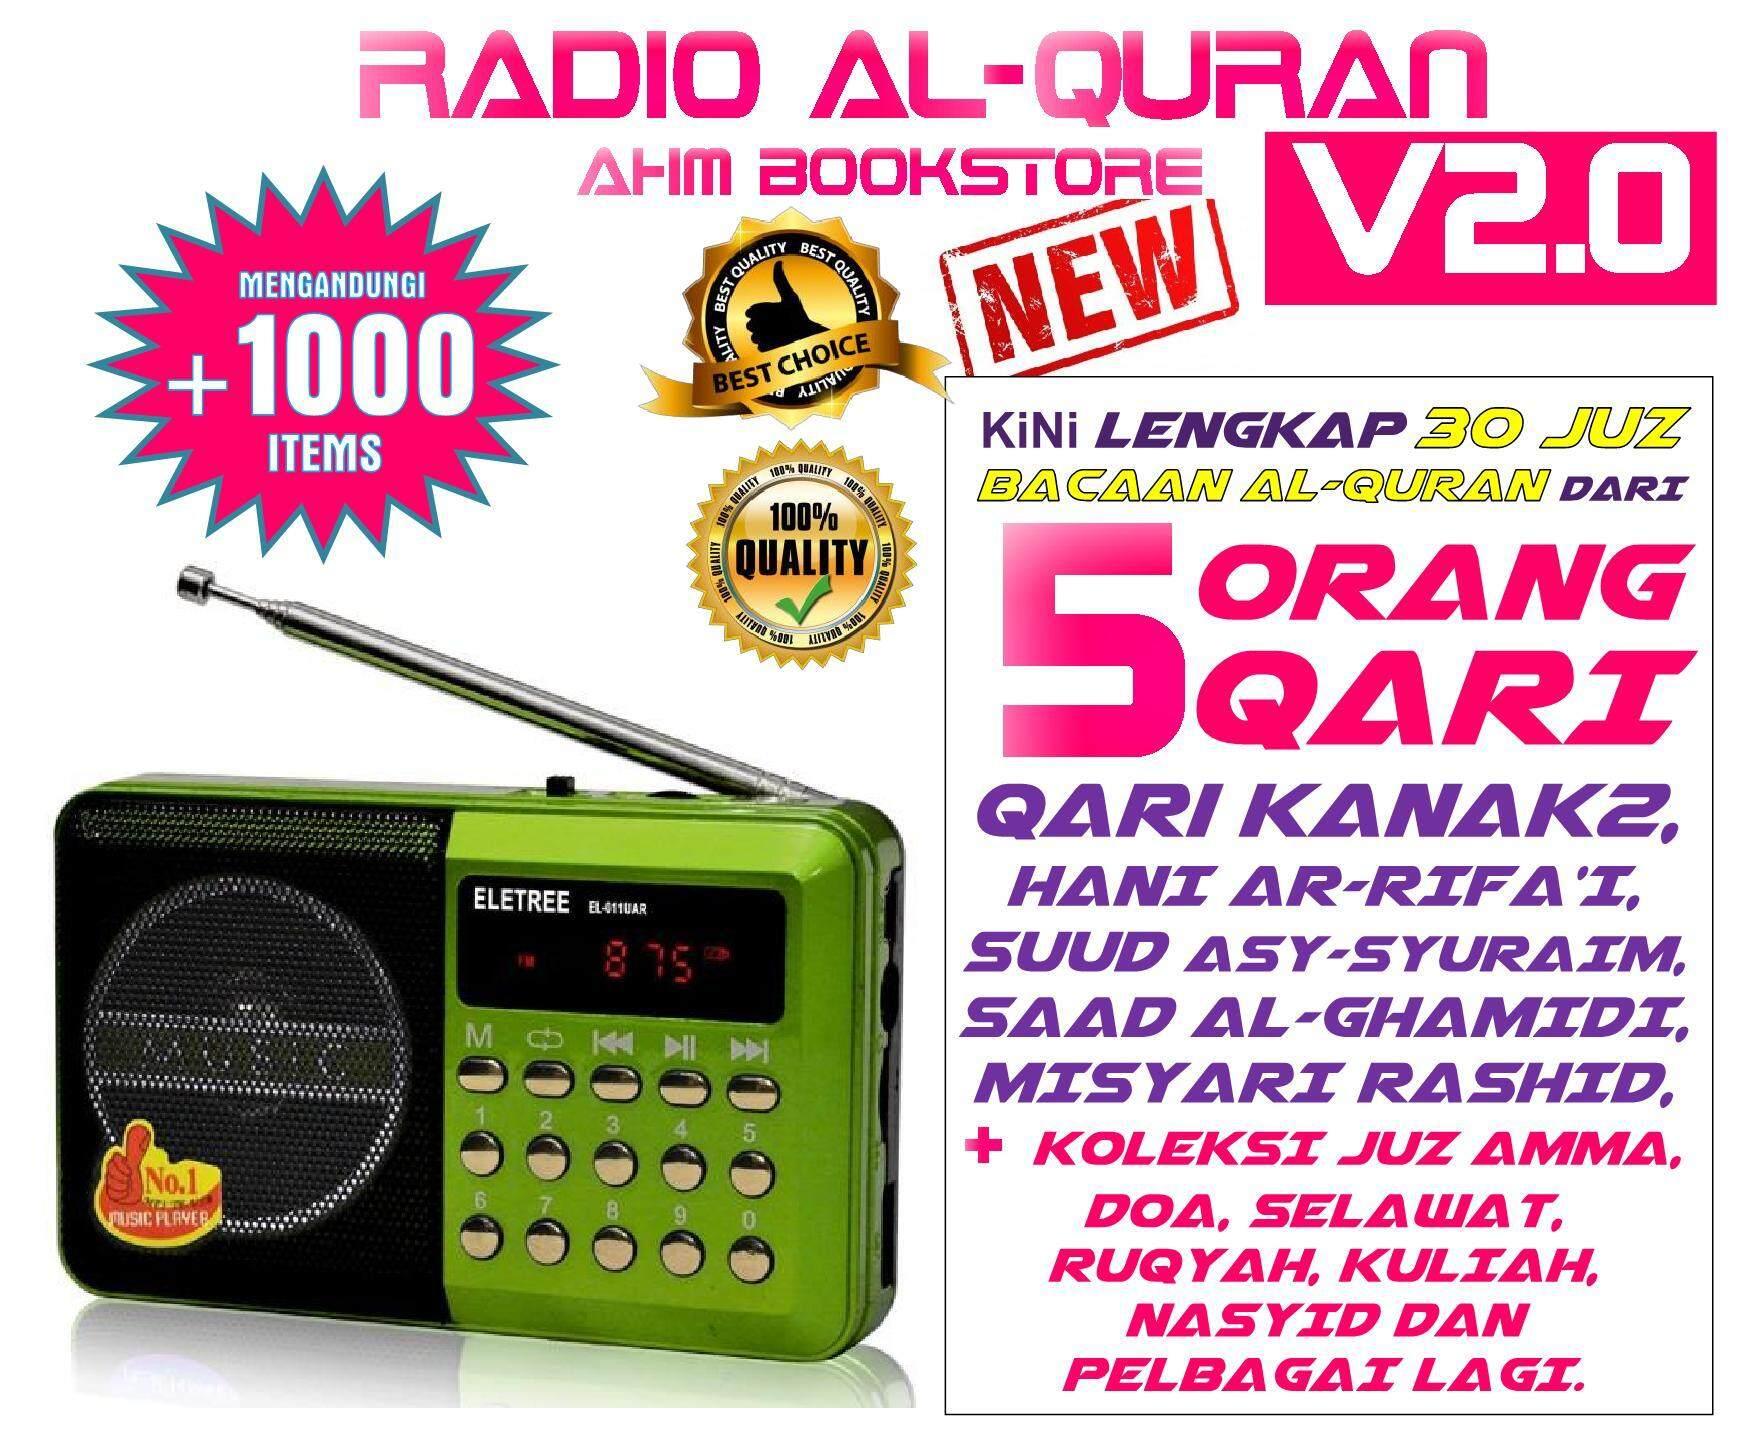 Radio Al-Quran Ahm Bookstore V2.0 Complete 30 Juz With 5 Qari Option (green) By Ahm Bookstore.